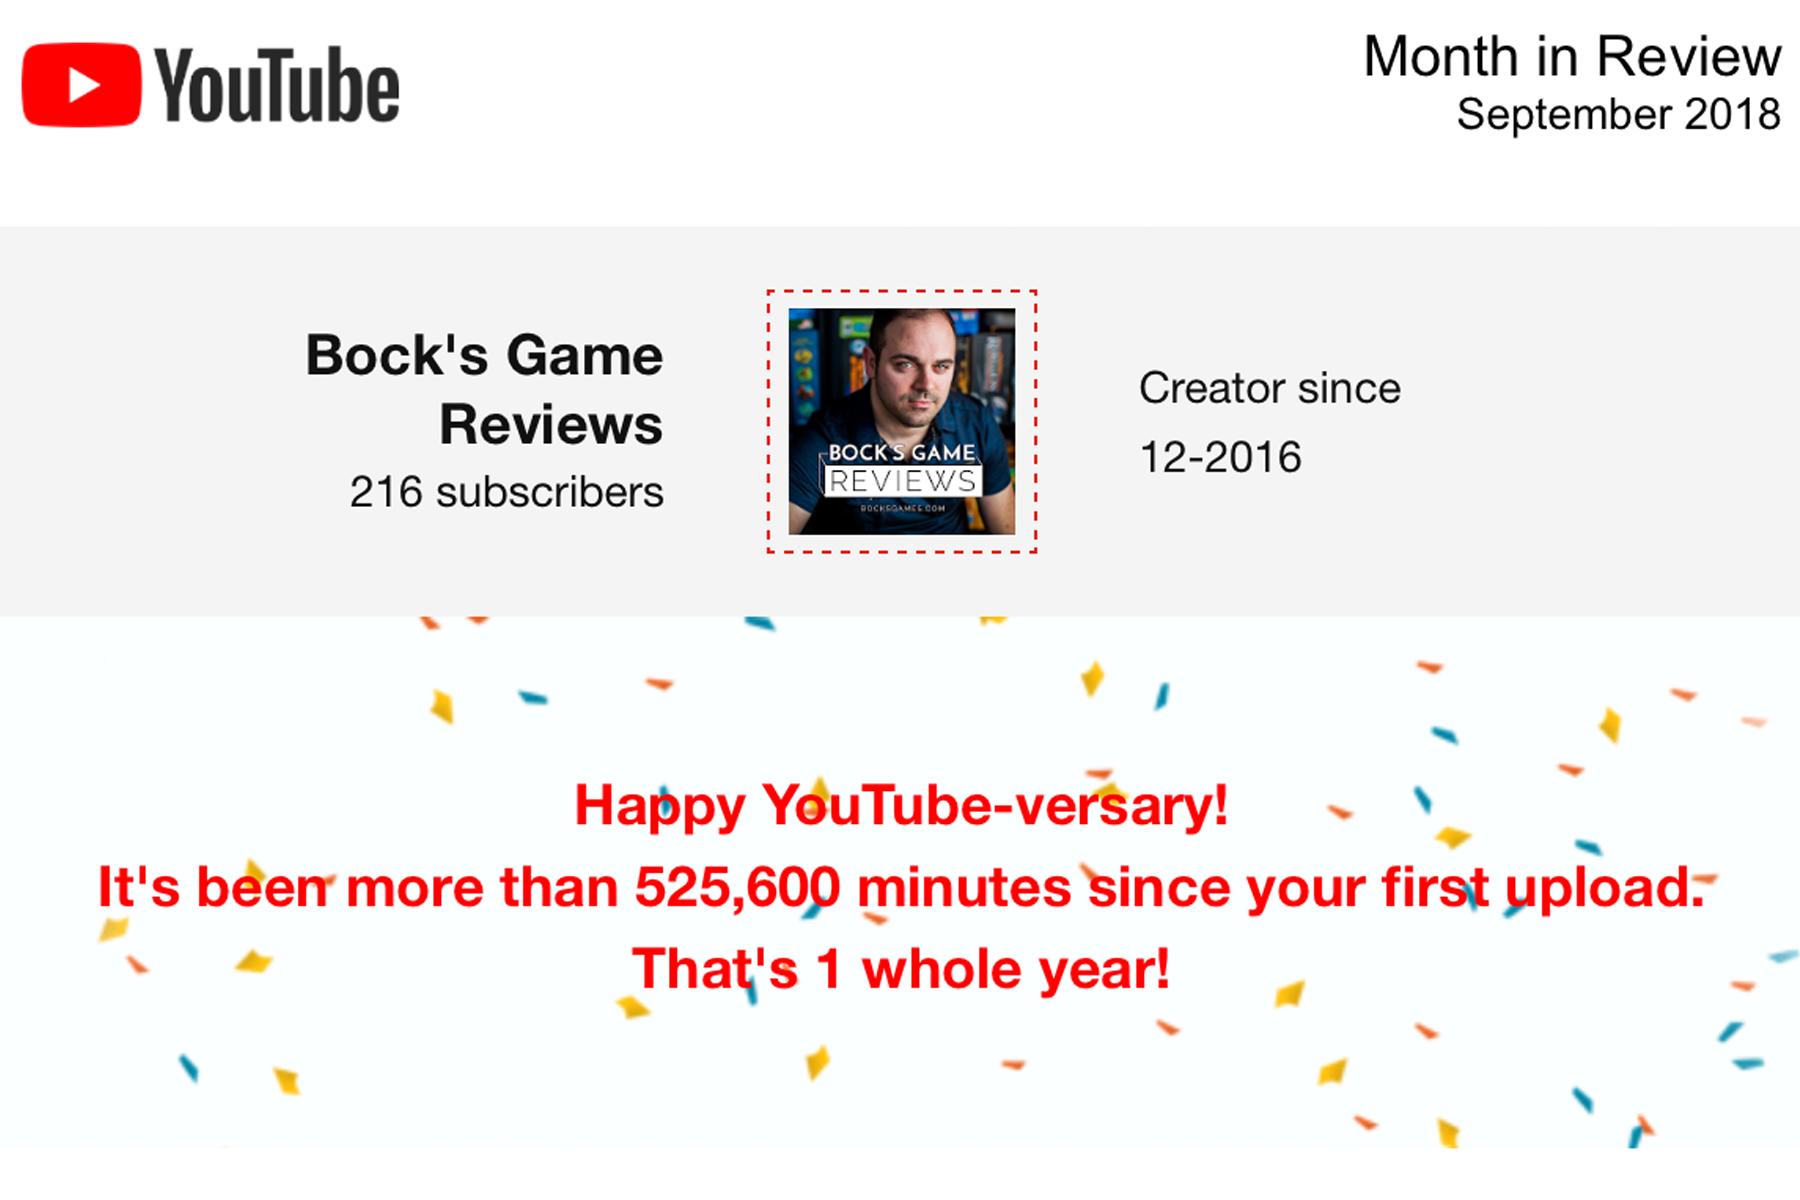 Bock's Games Anniversary